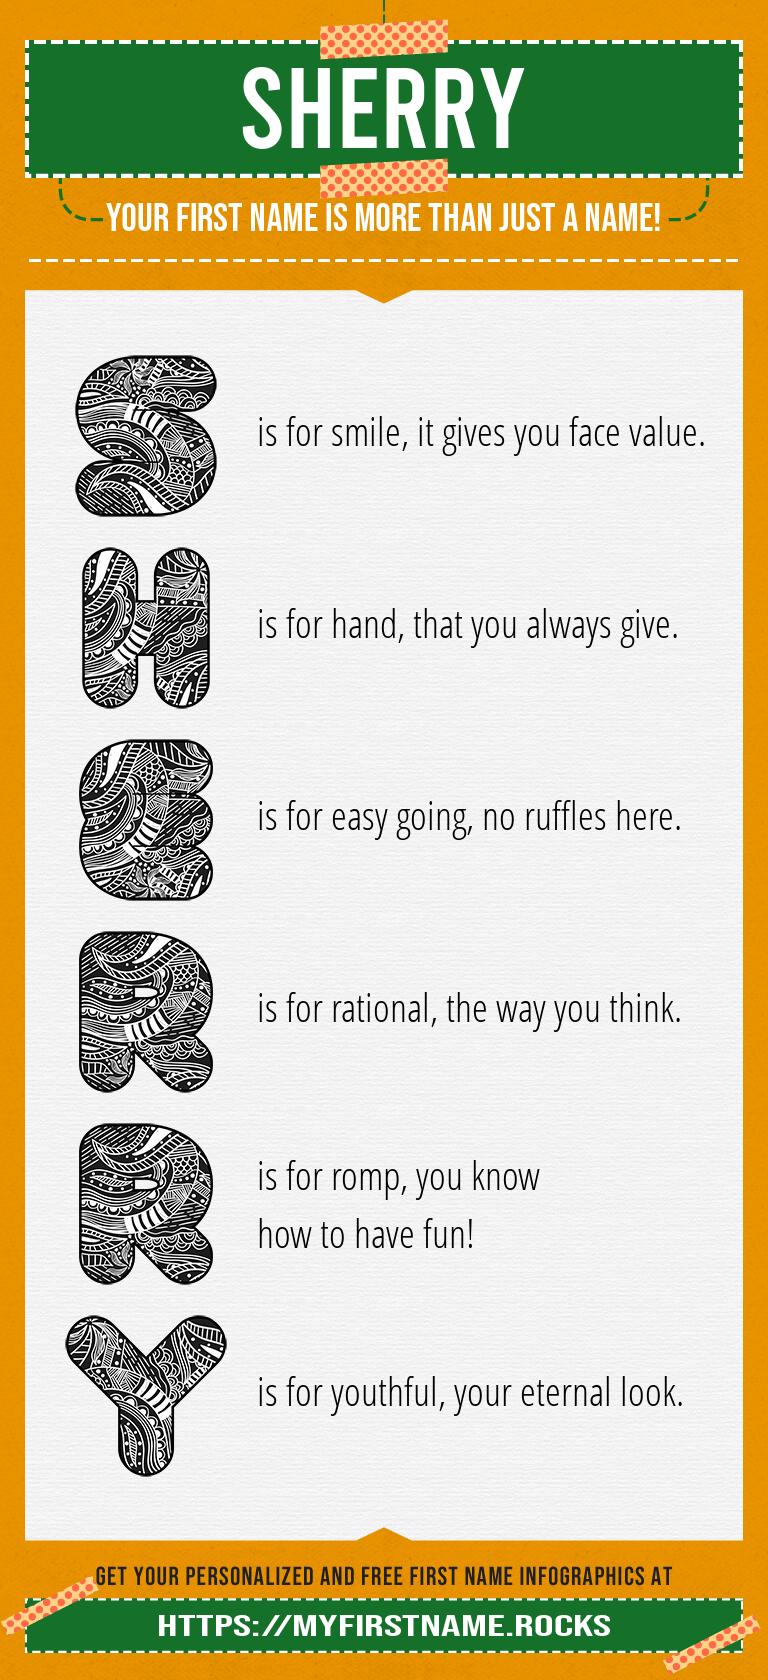 Sherry Infographics